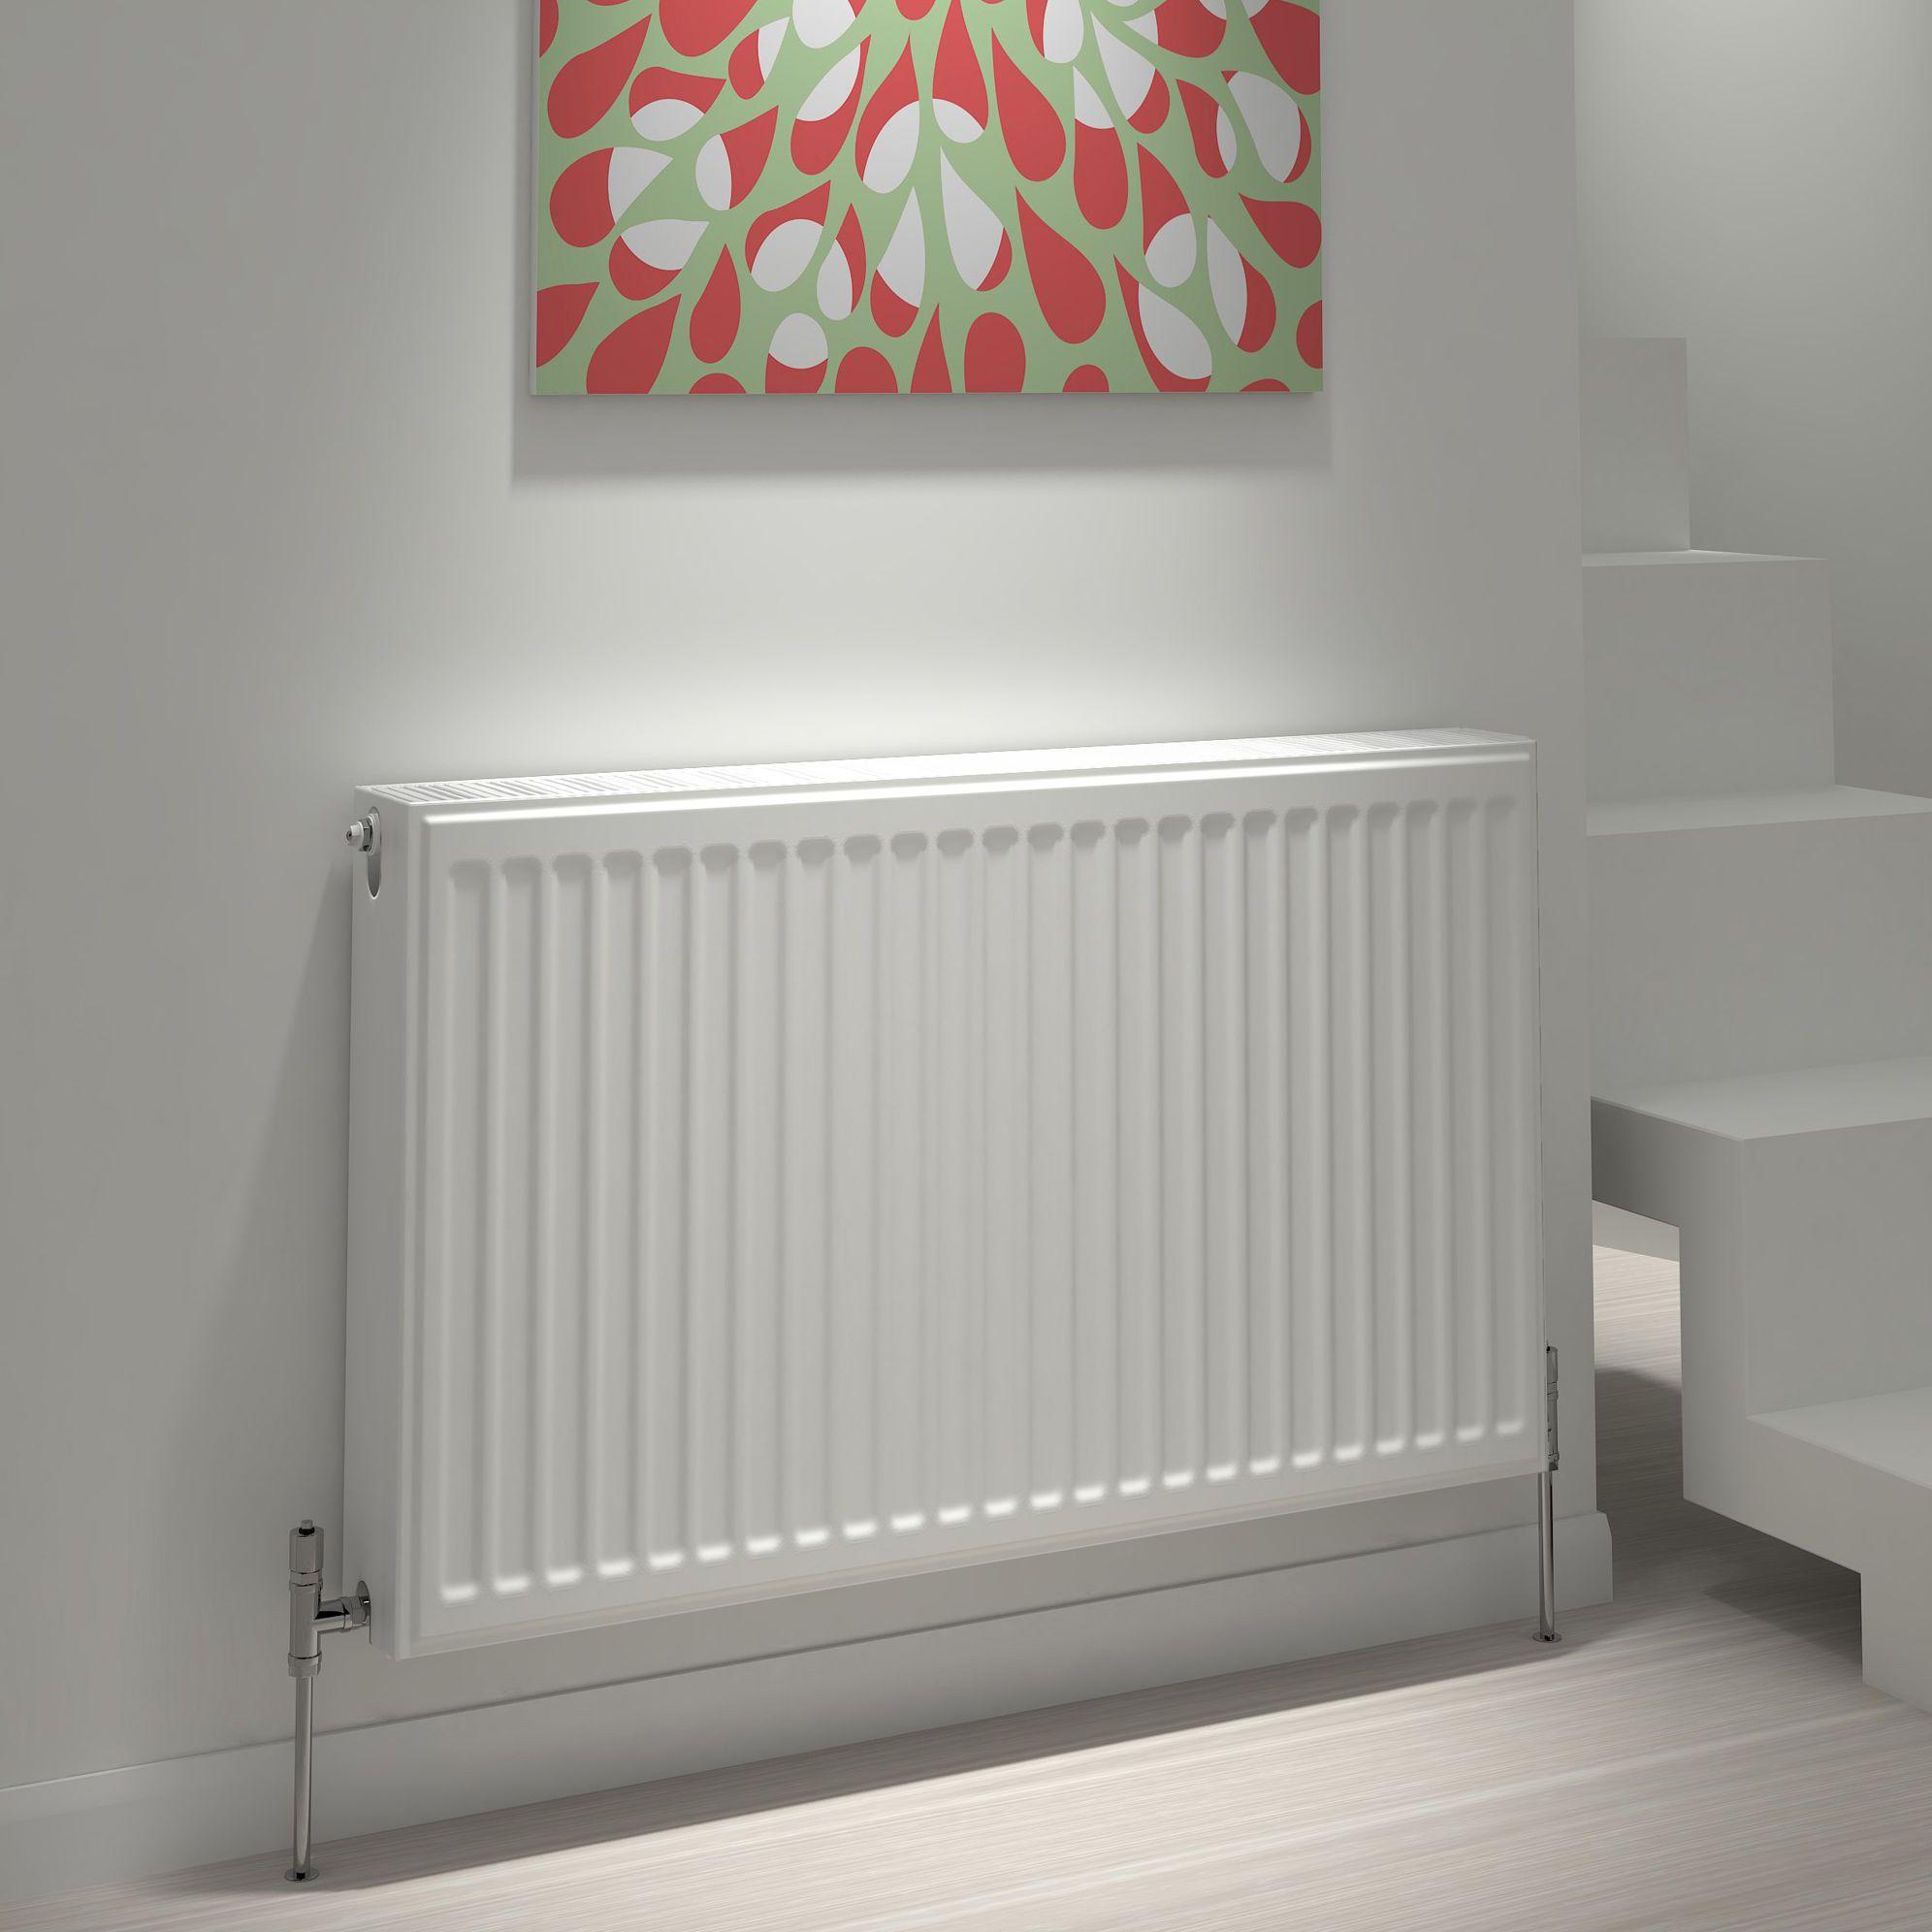 Kudox Type 22 double Panel radiator White, (H)600mm